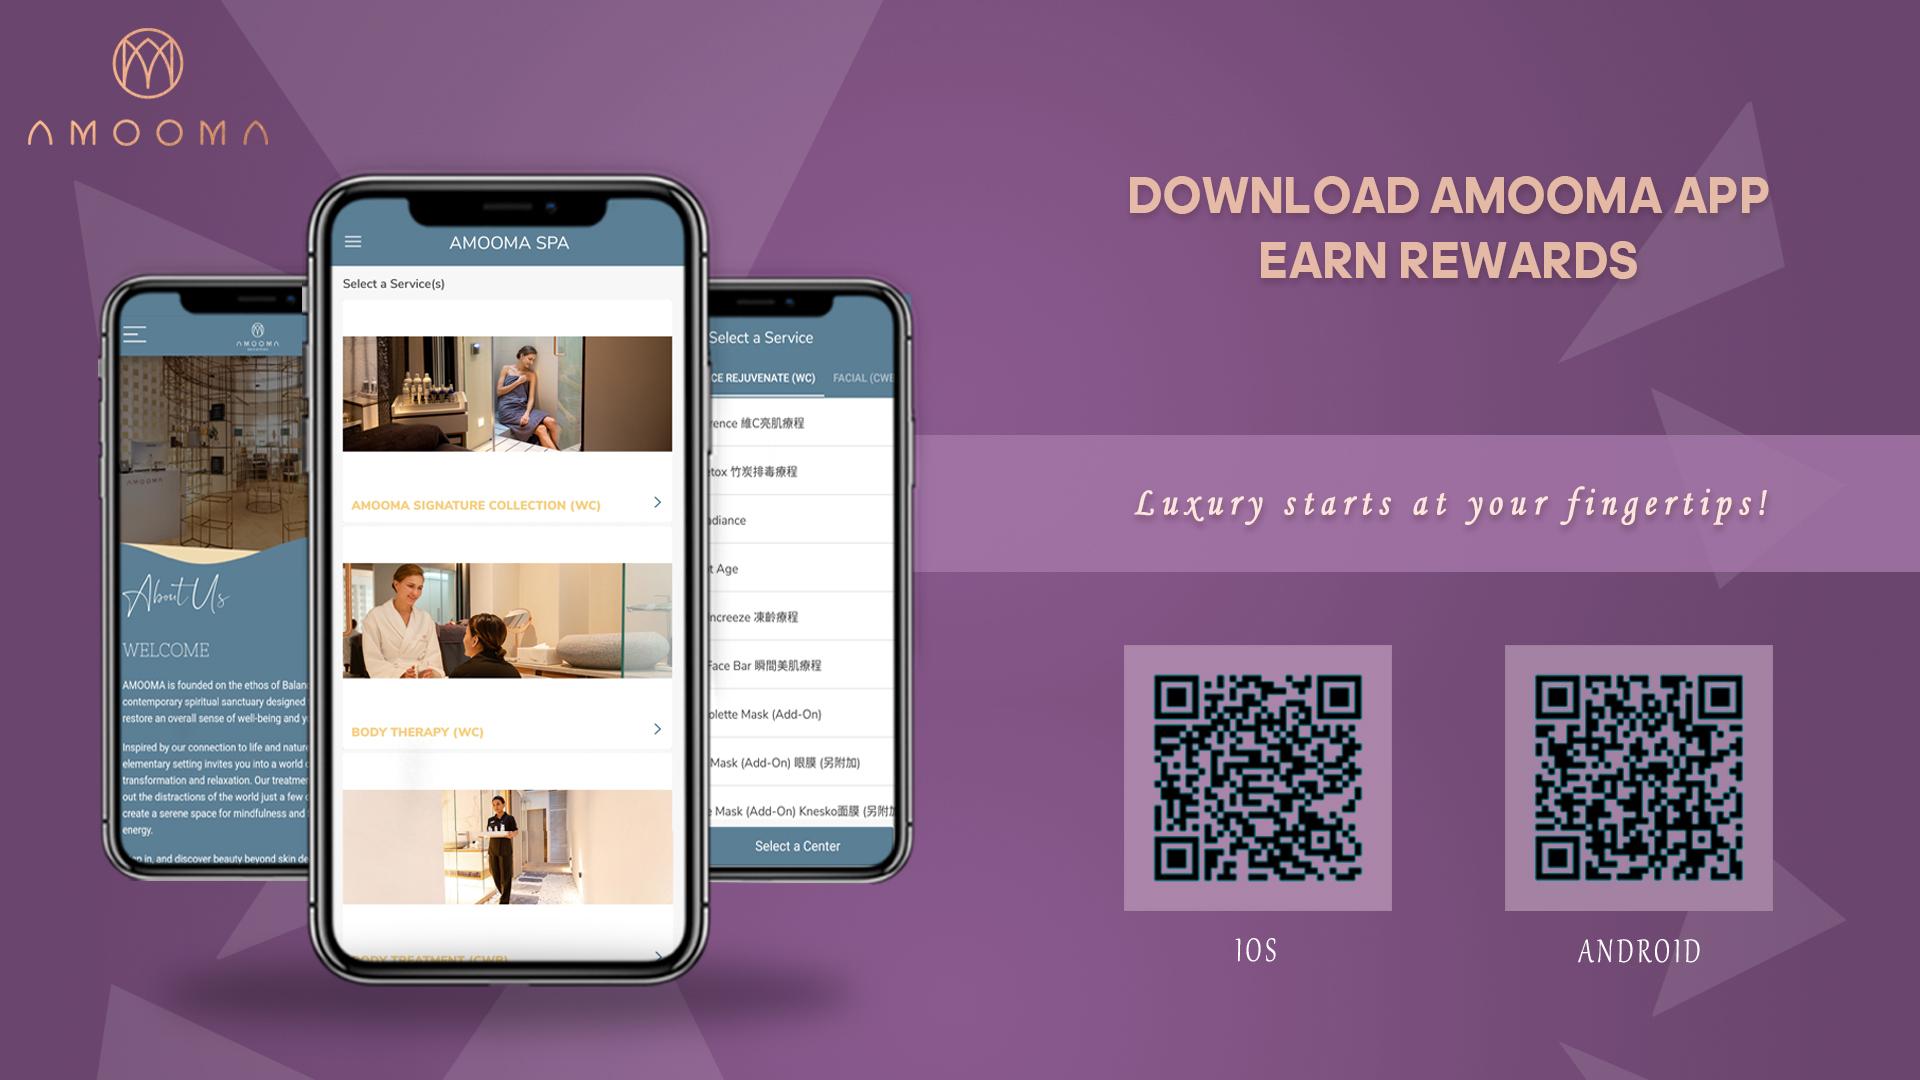 Download AMOOMA App & Earn Rewards – AMOOMA Spa & Sanctuary